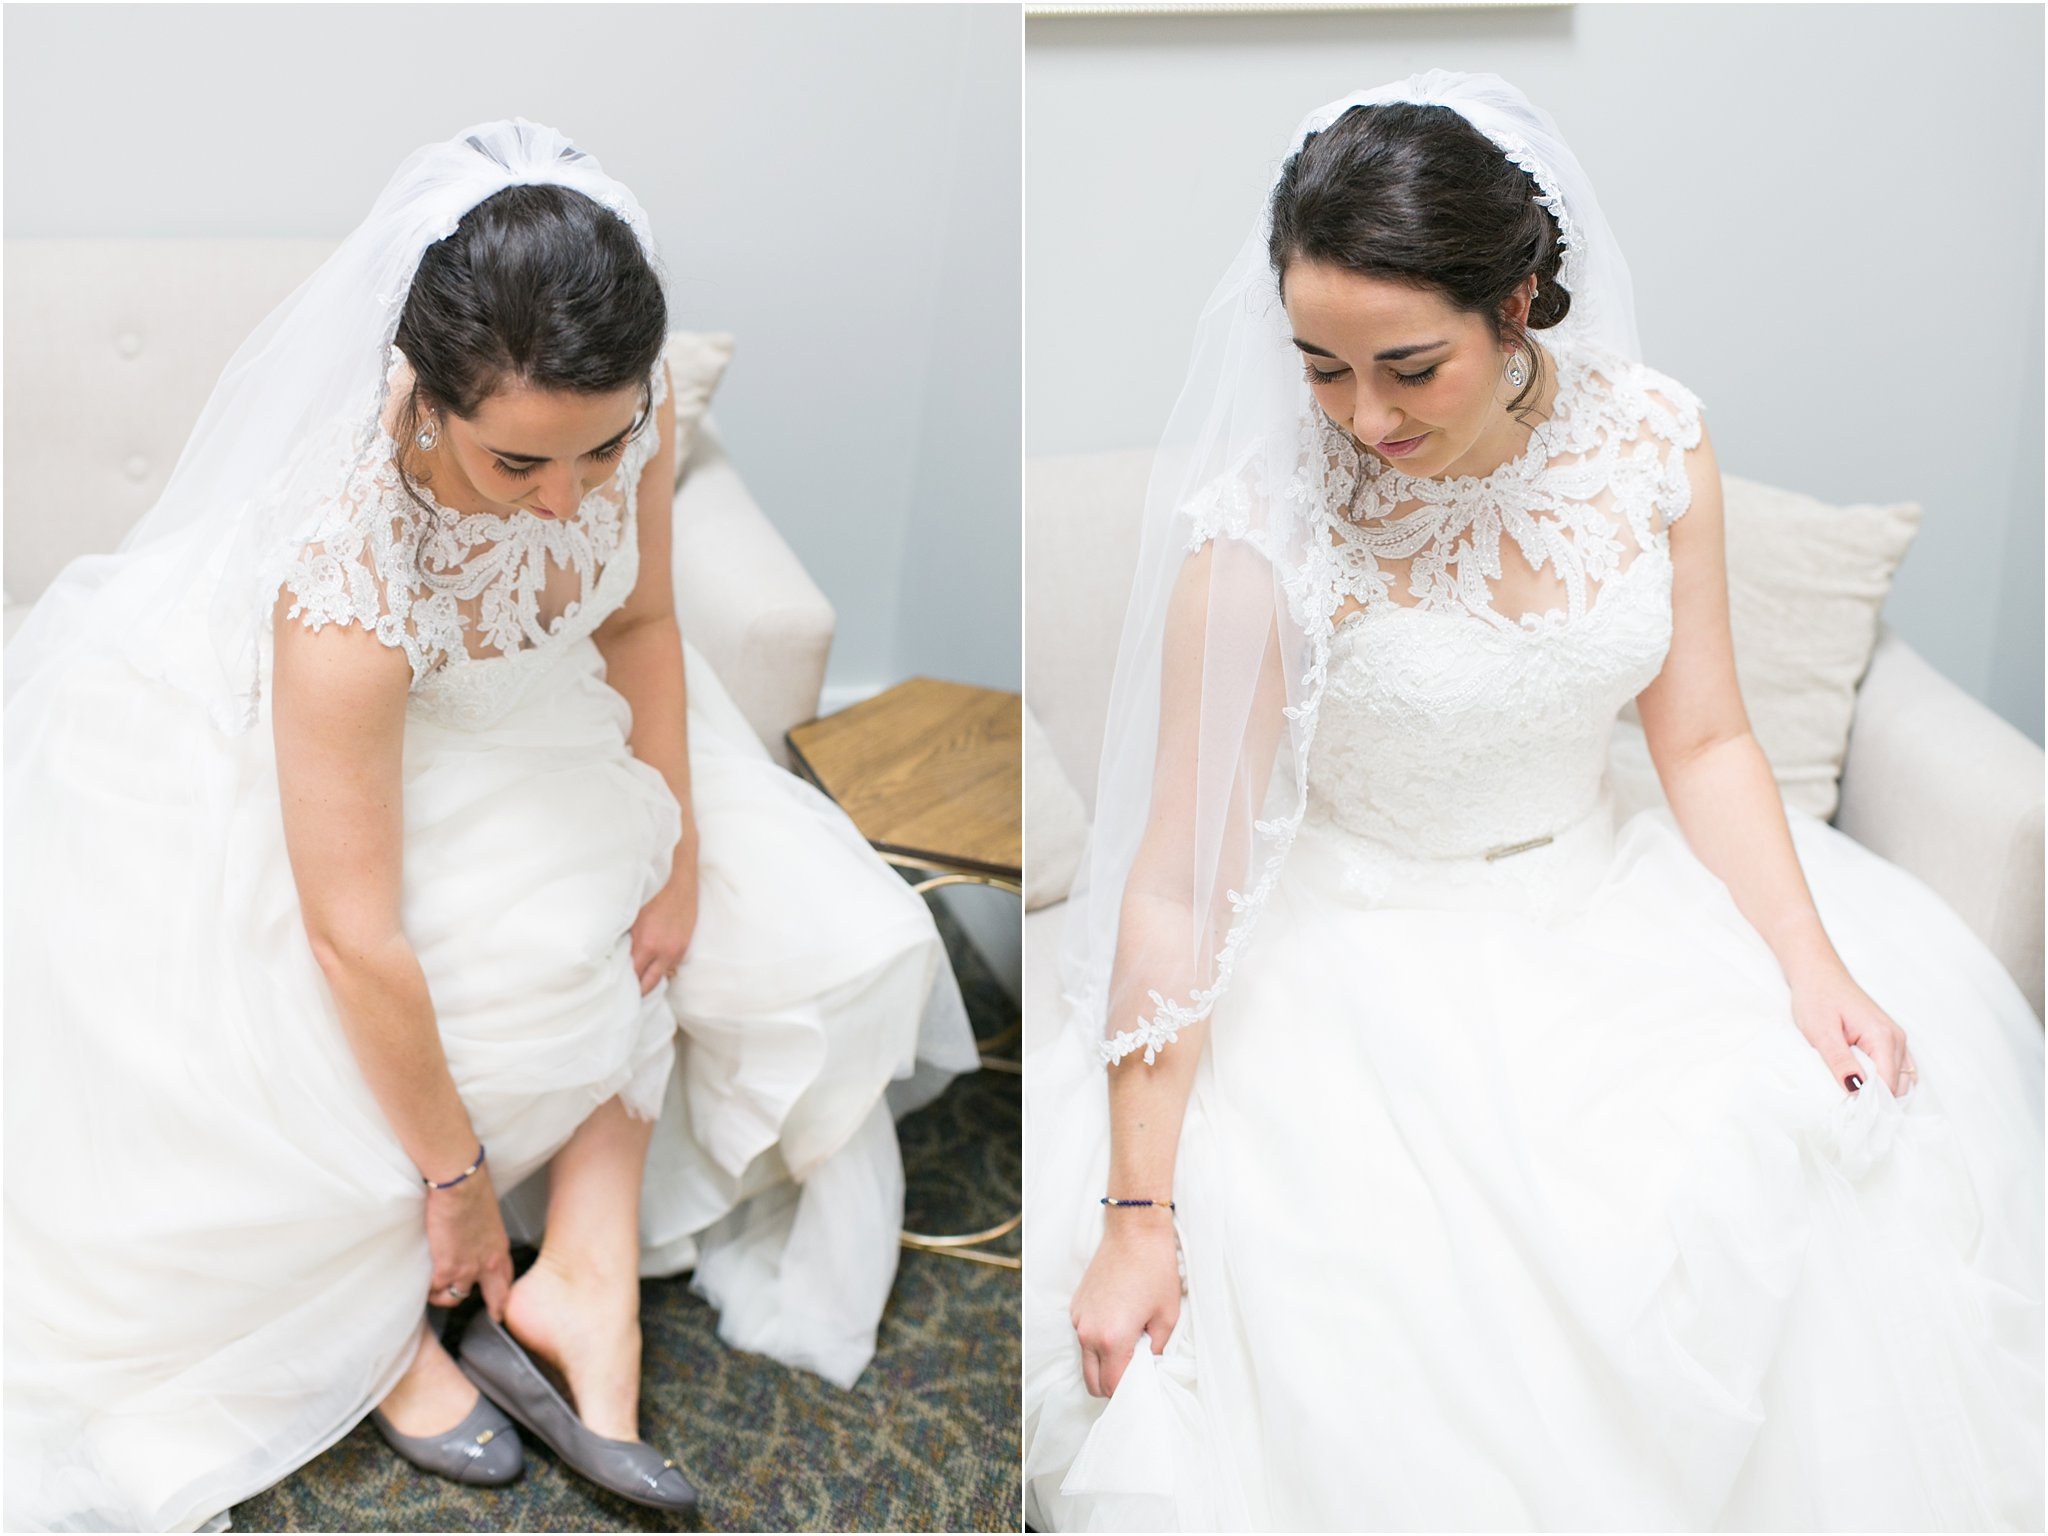 jessica_ryan_photography_virginia_wedding_photographer_wedding_hurricane_norfolk_botanical_gardens_hurricane_matthew_wedding_3560